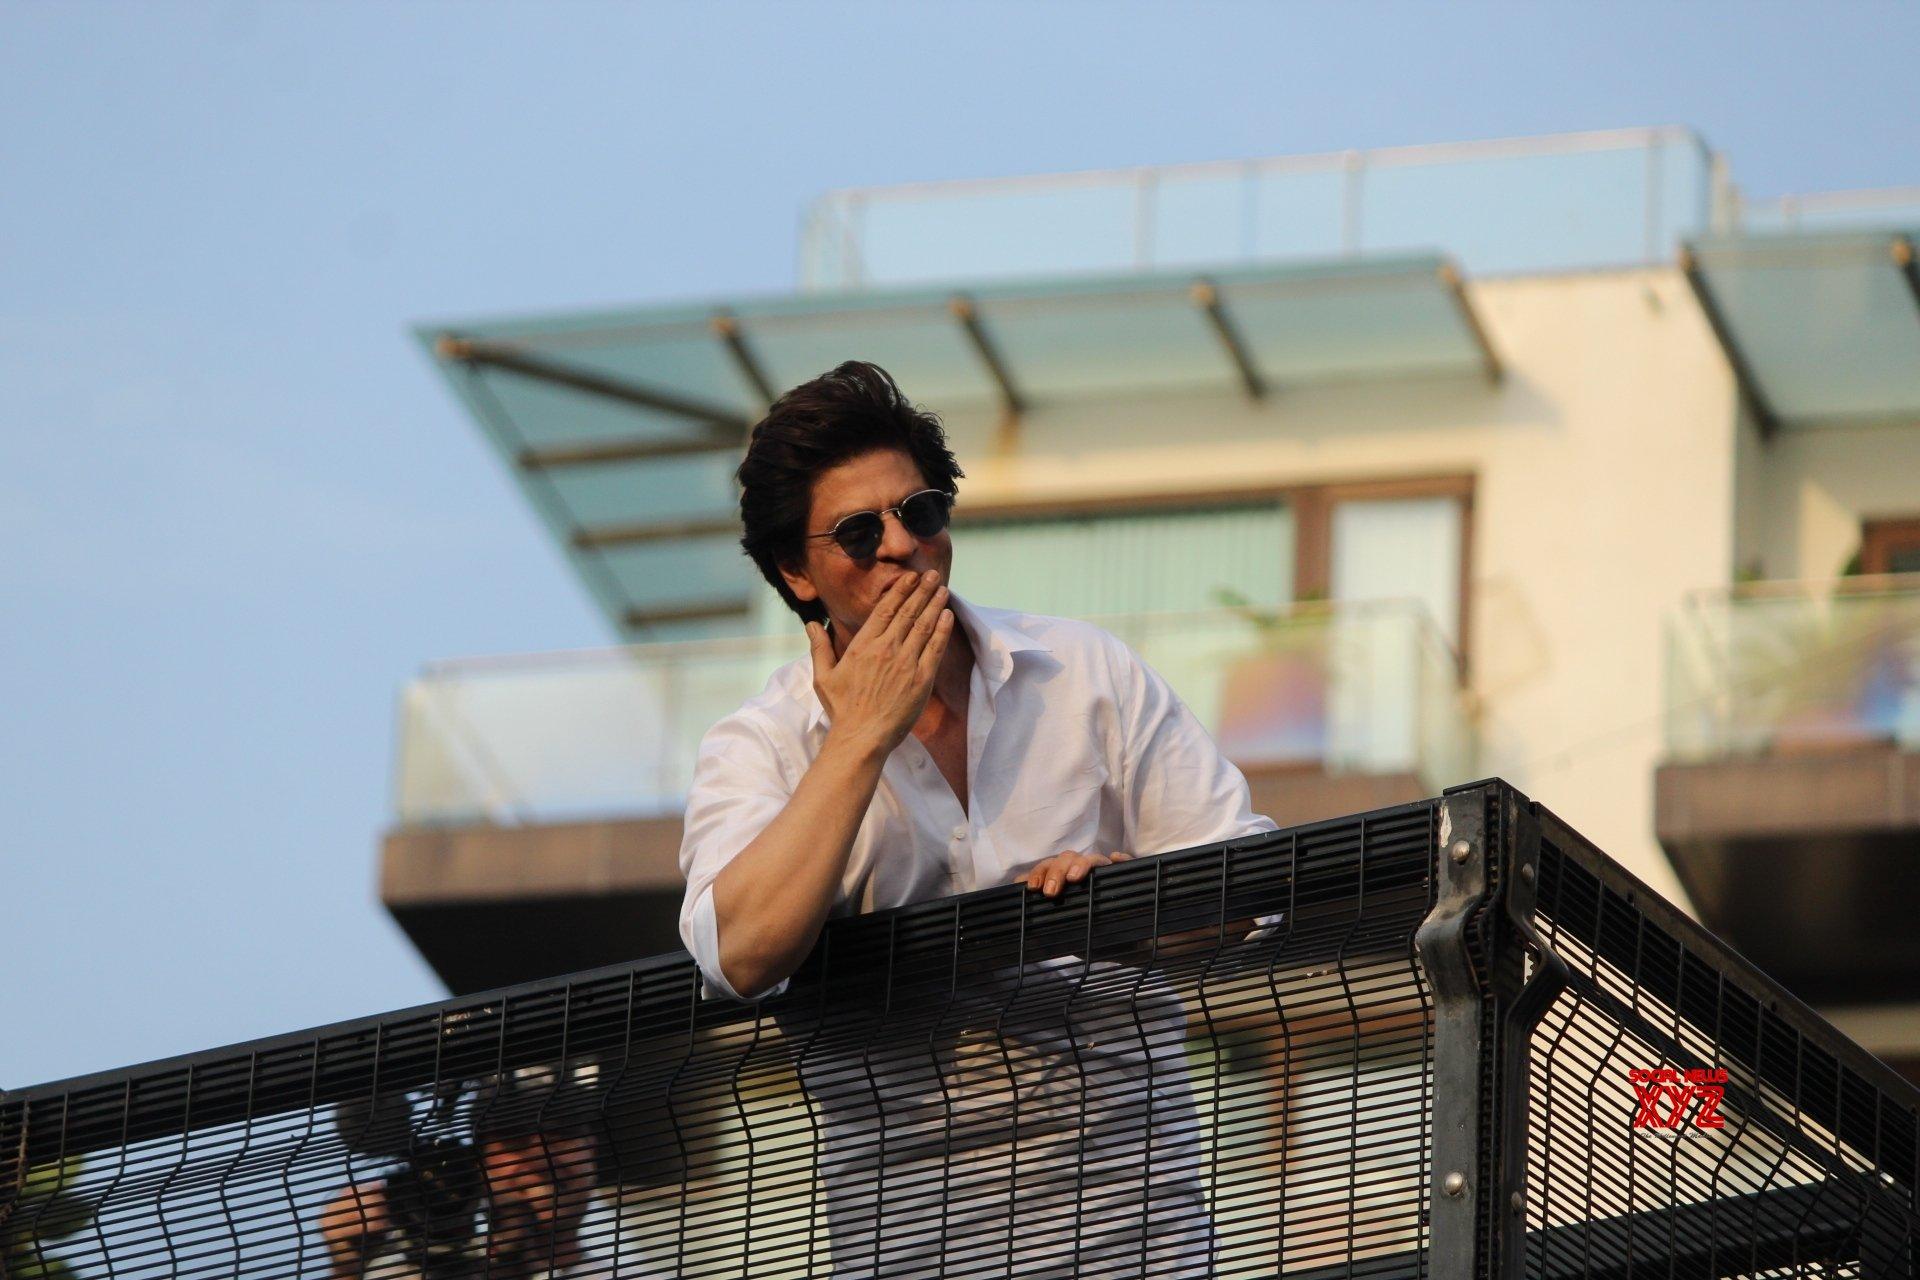 SRK's Eid tip: 'Give yourself a self-hug'